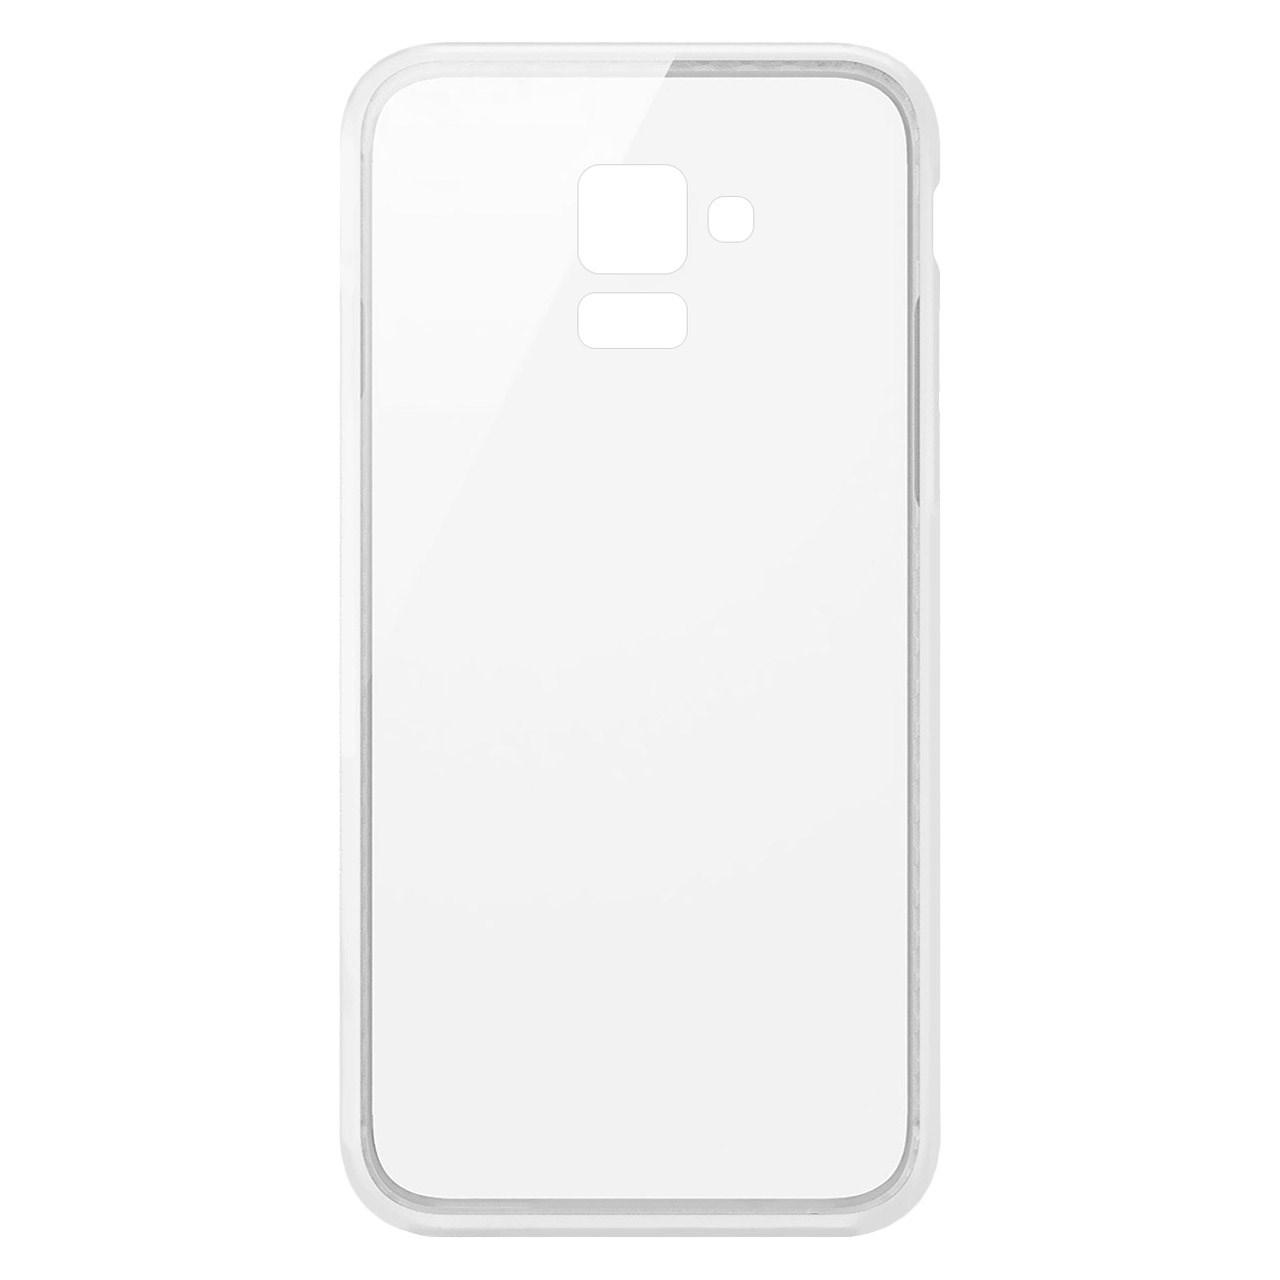 کاور  مدل Clear TPU مناسب برای گوشی موبایل سامسونگ Galaxy A8 2018